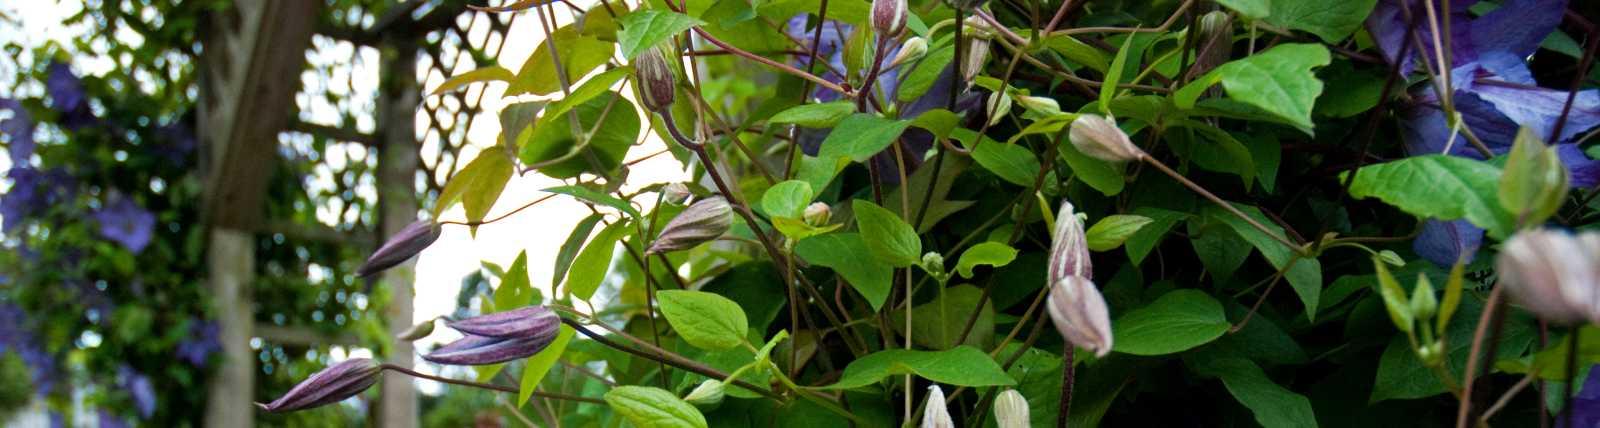 Washington Park Florist